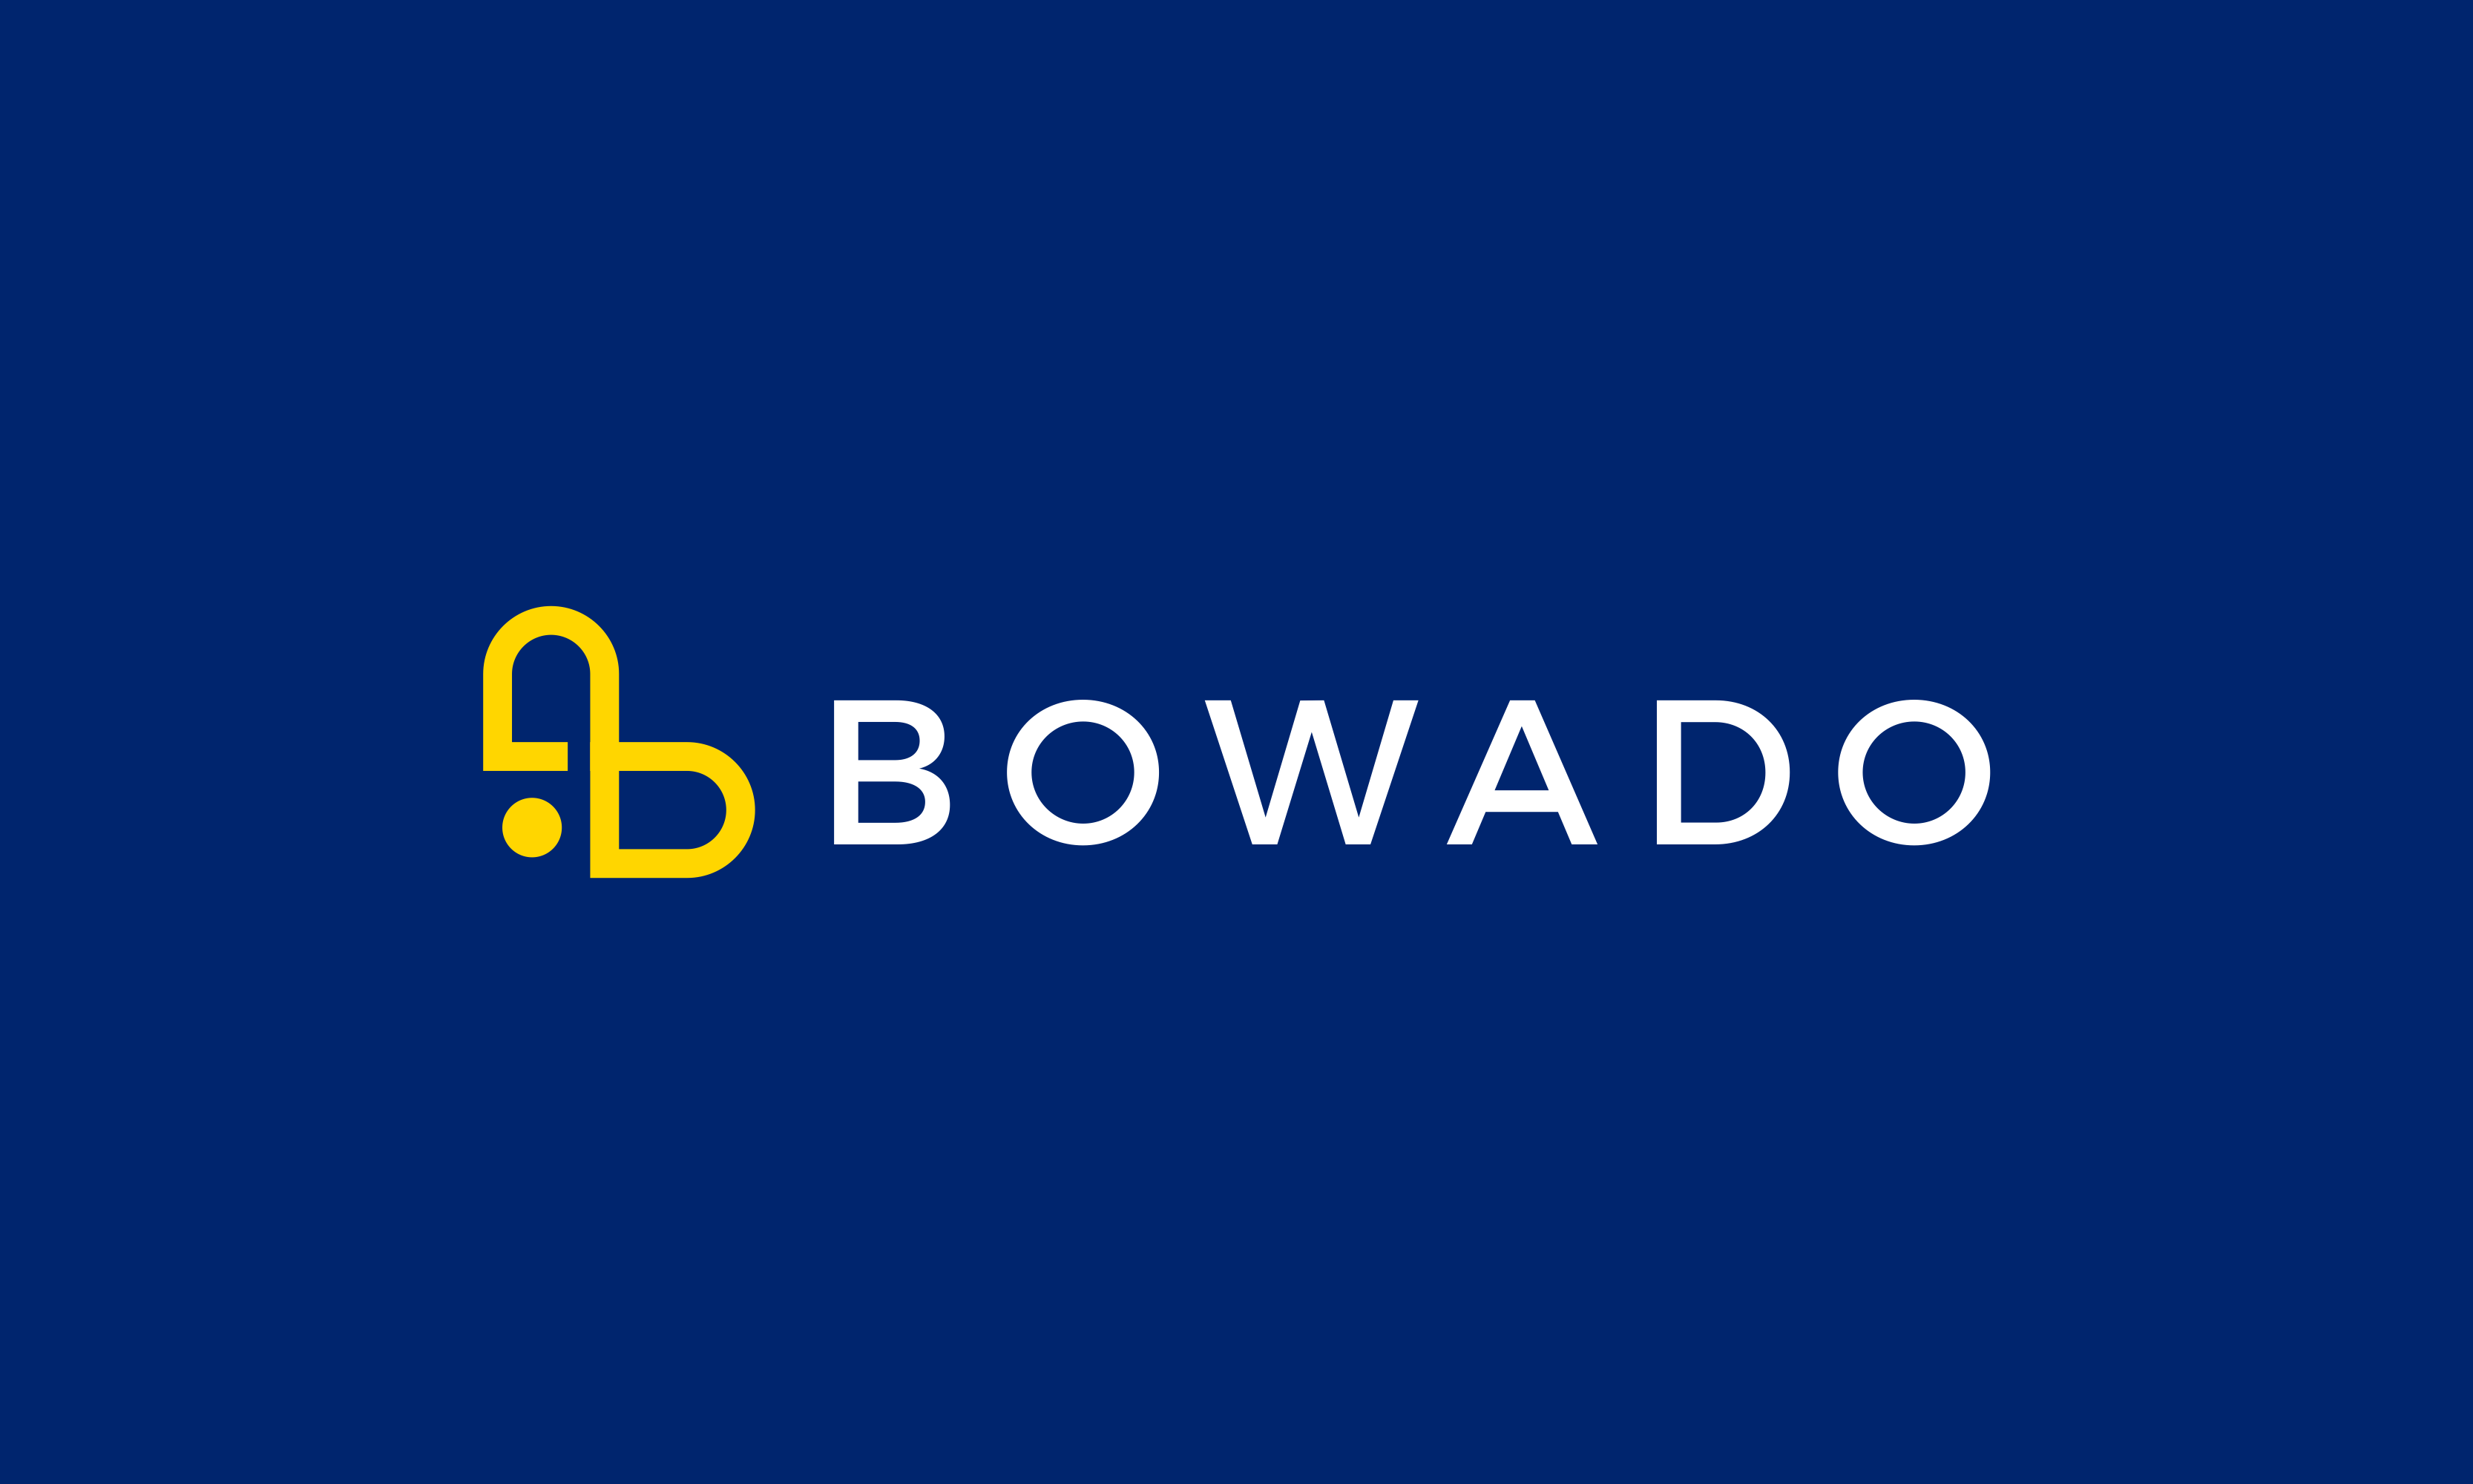 Bowado